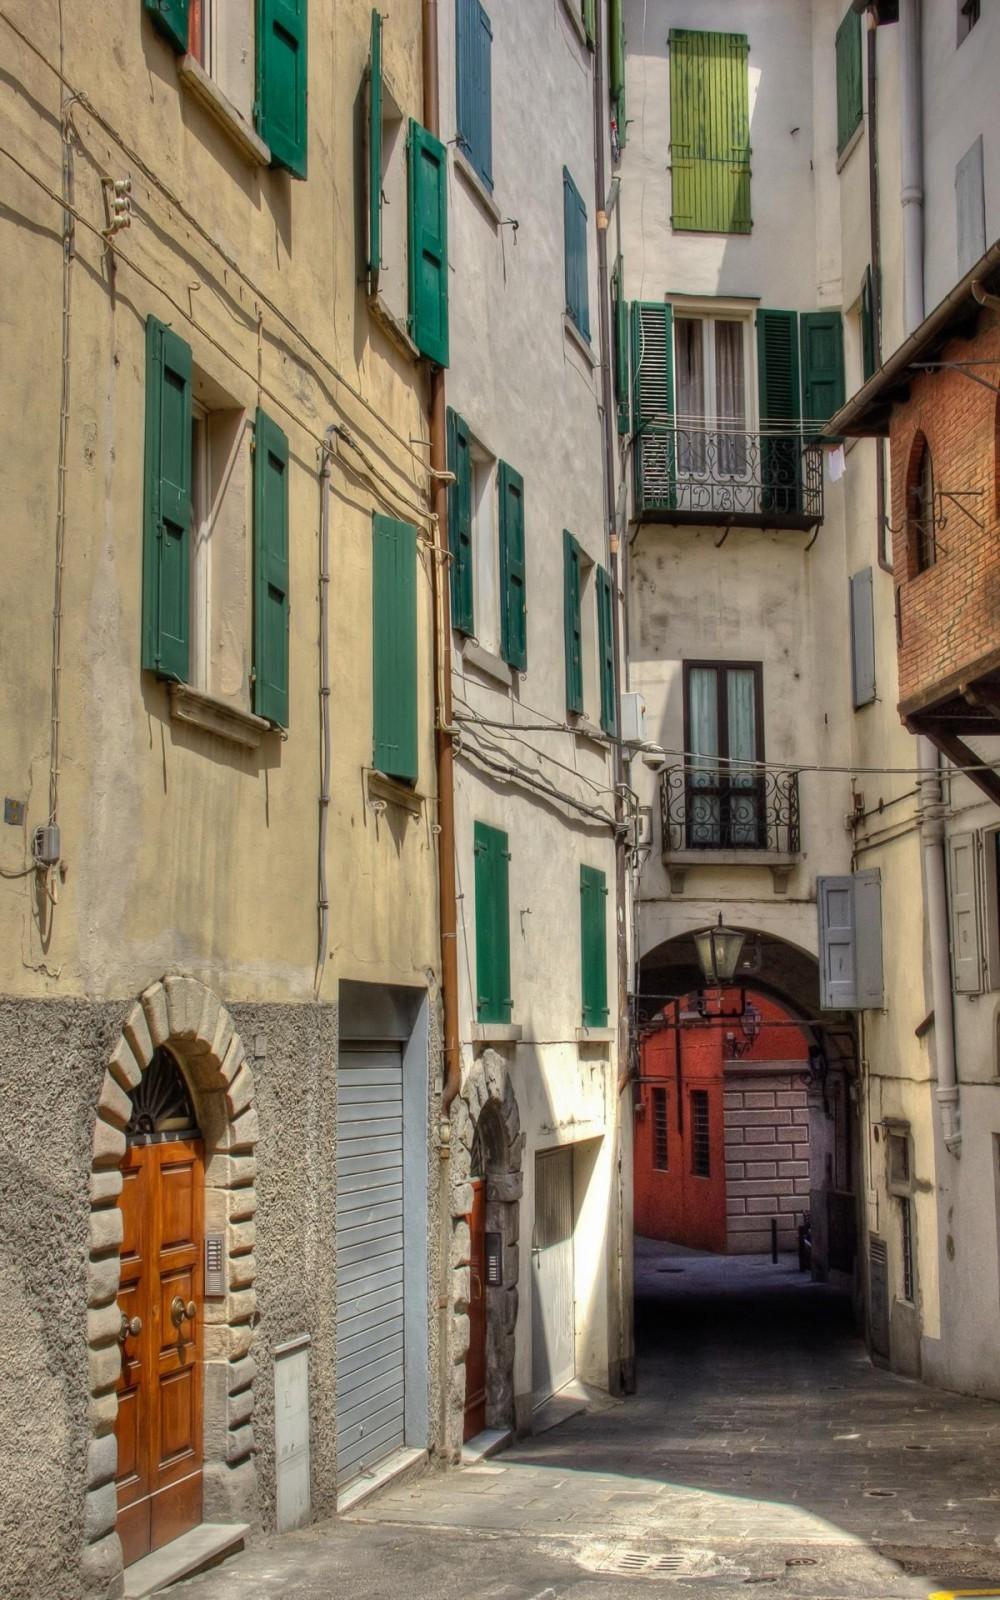 Porretta Terme Alleys